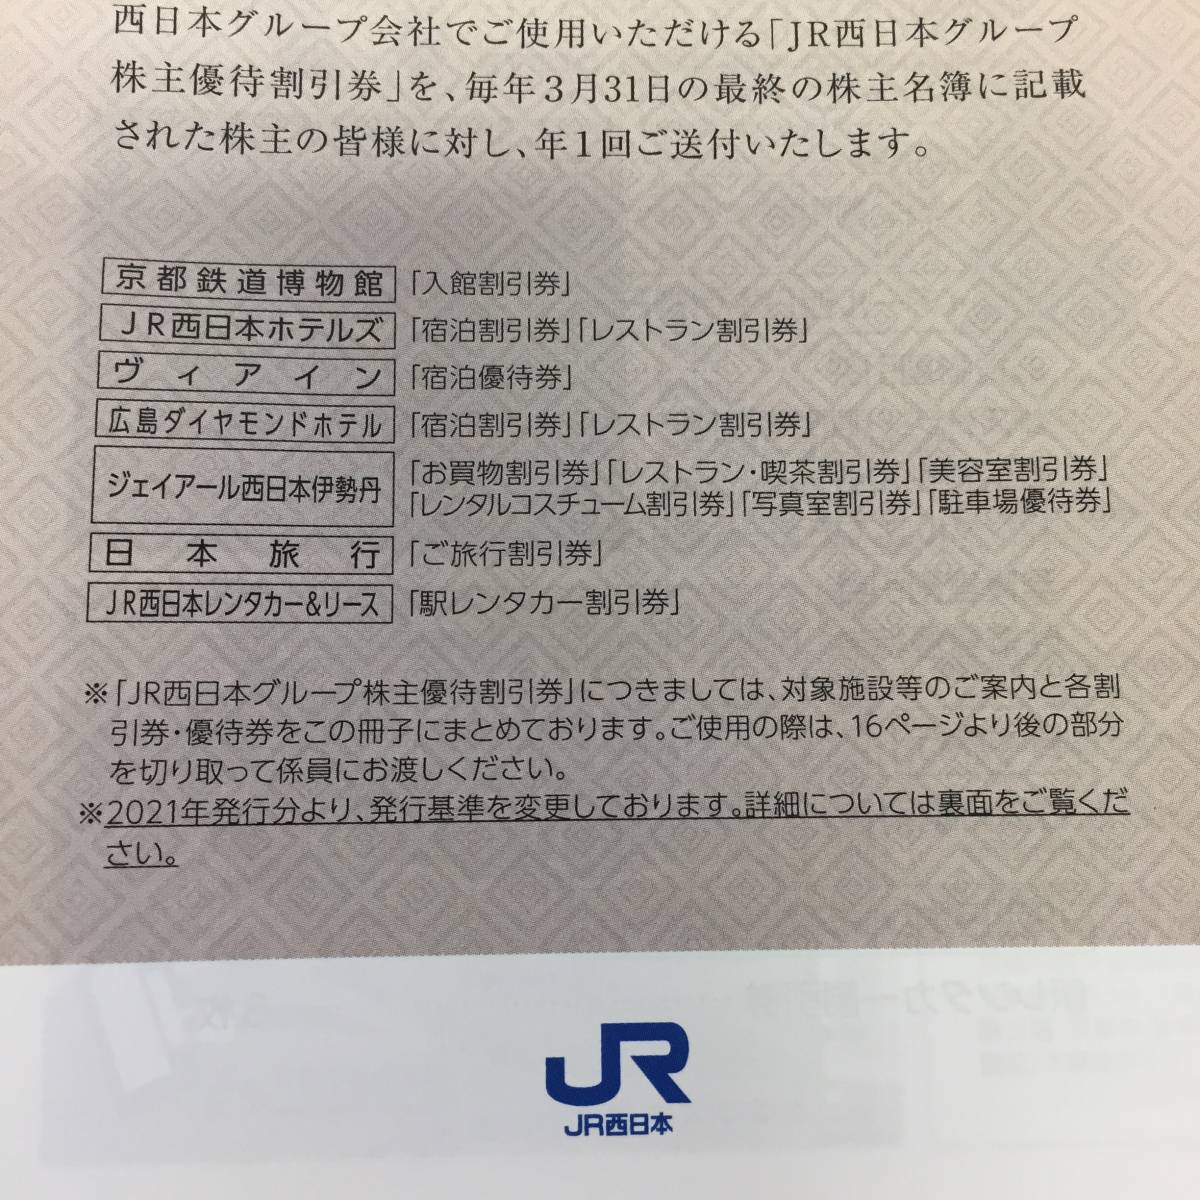 【1073364】JR西日本グループ株主優待割引券 鉄道博物館入館割引券☆2022年5月31日まで_画像6